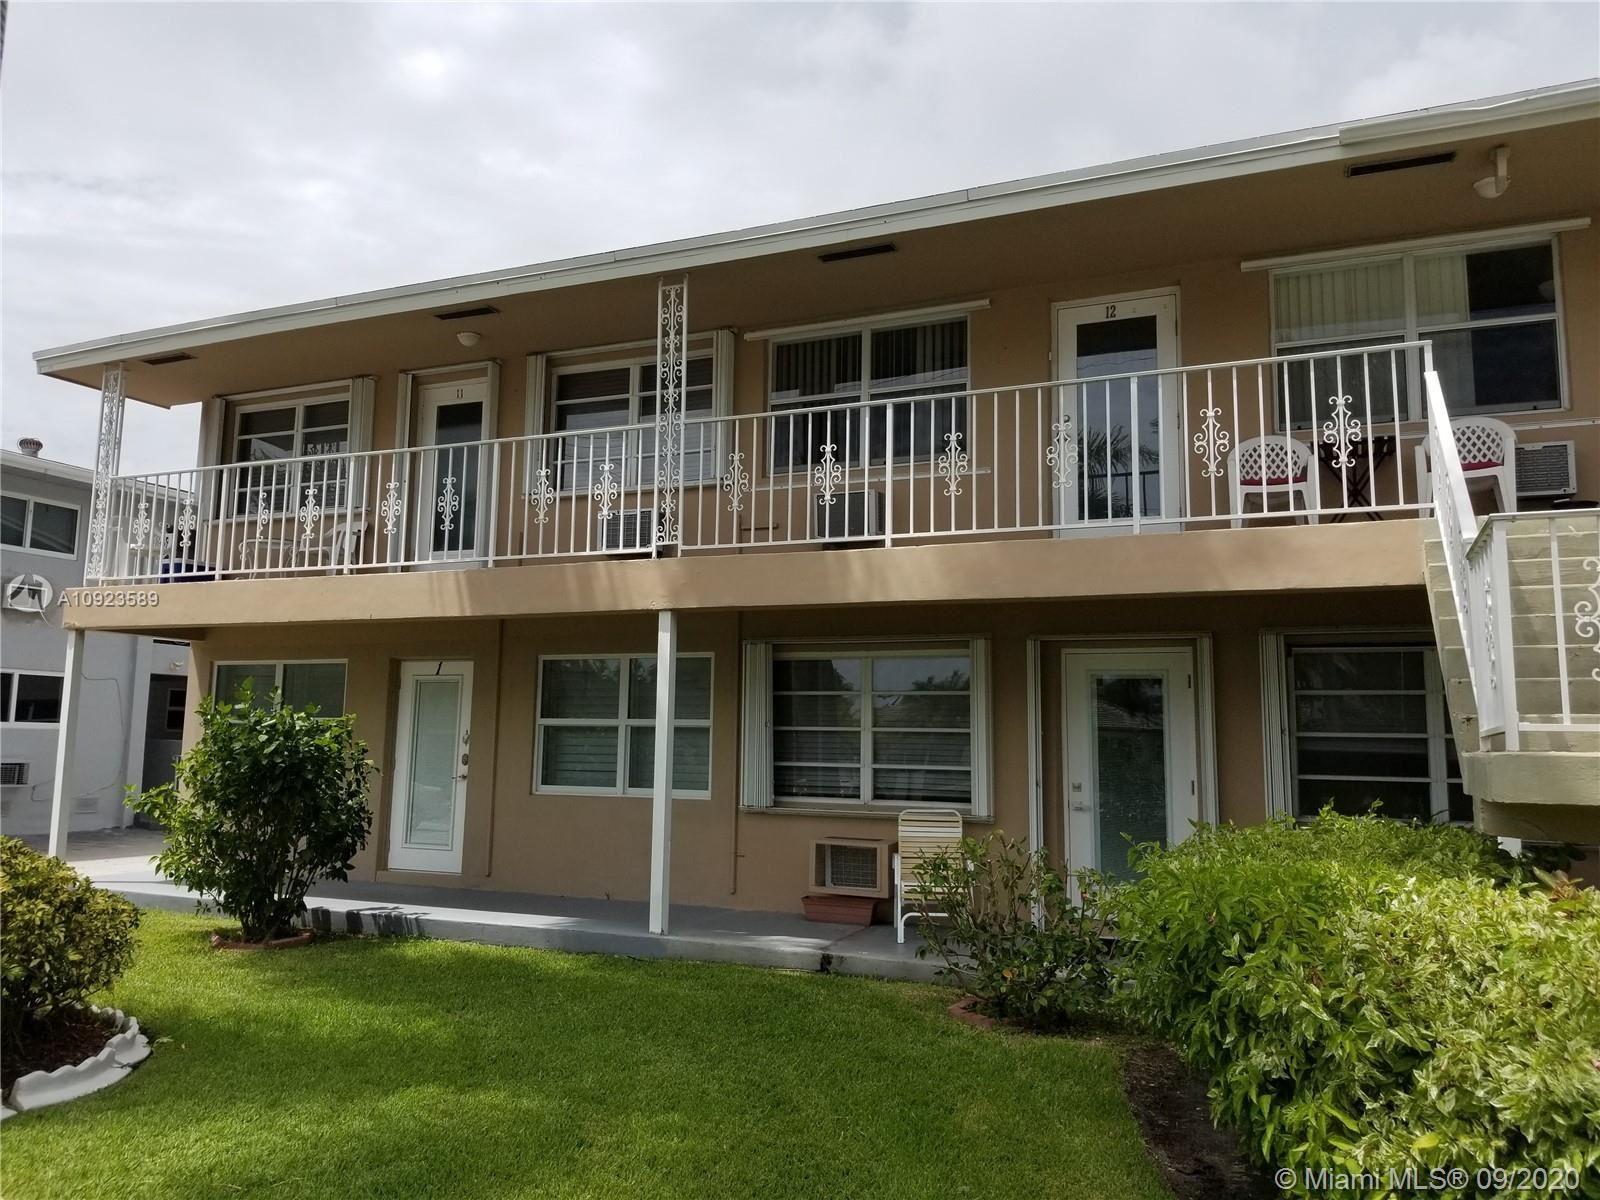 Photo of 500 Layne Blvd #4, Hallandale Beach, FL 33009 (MLS # A10923589)